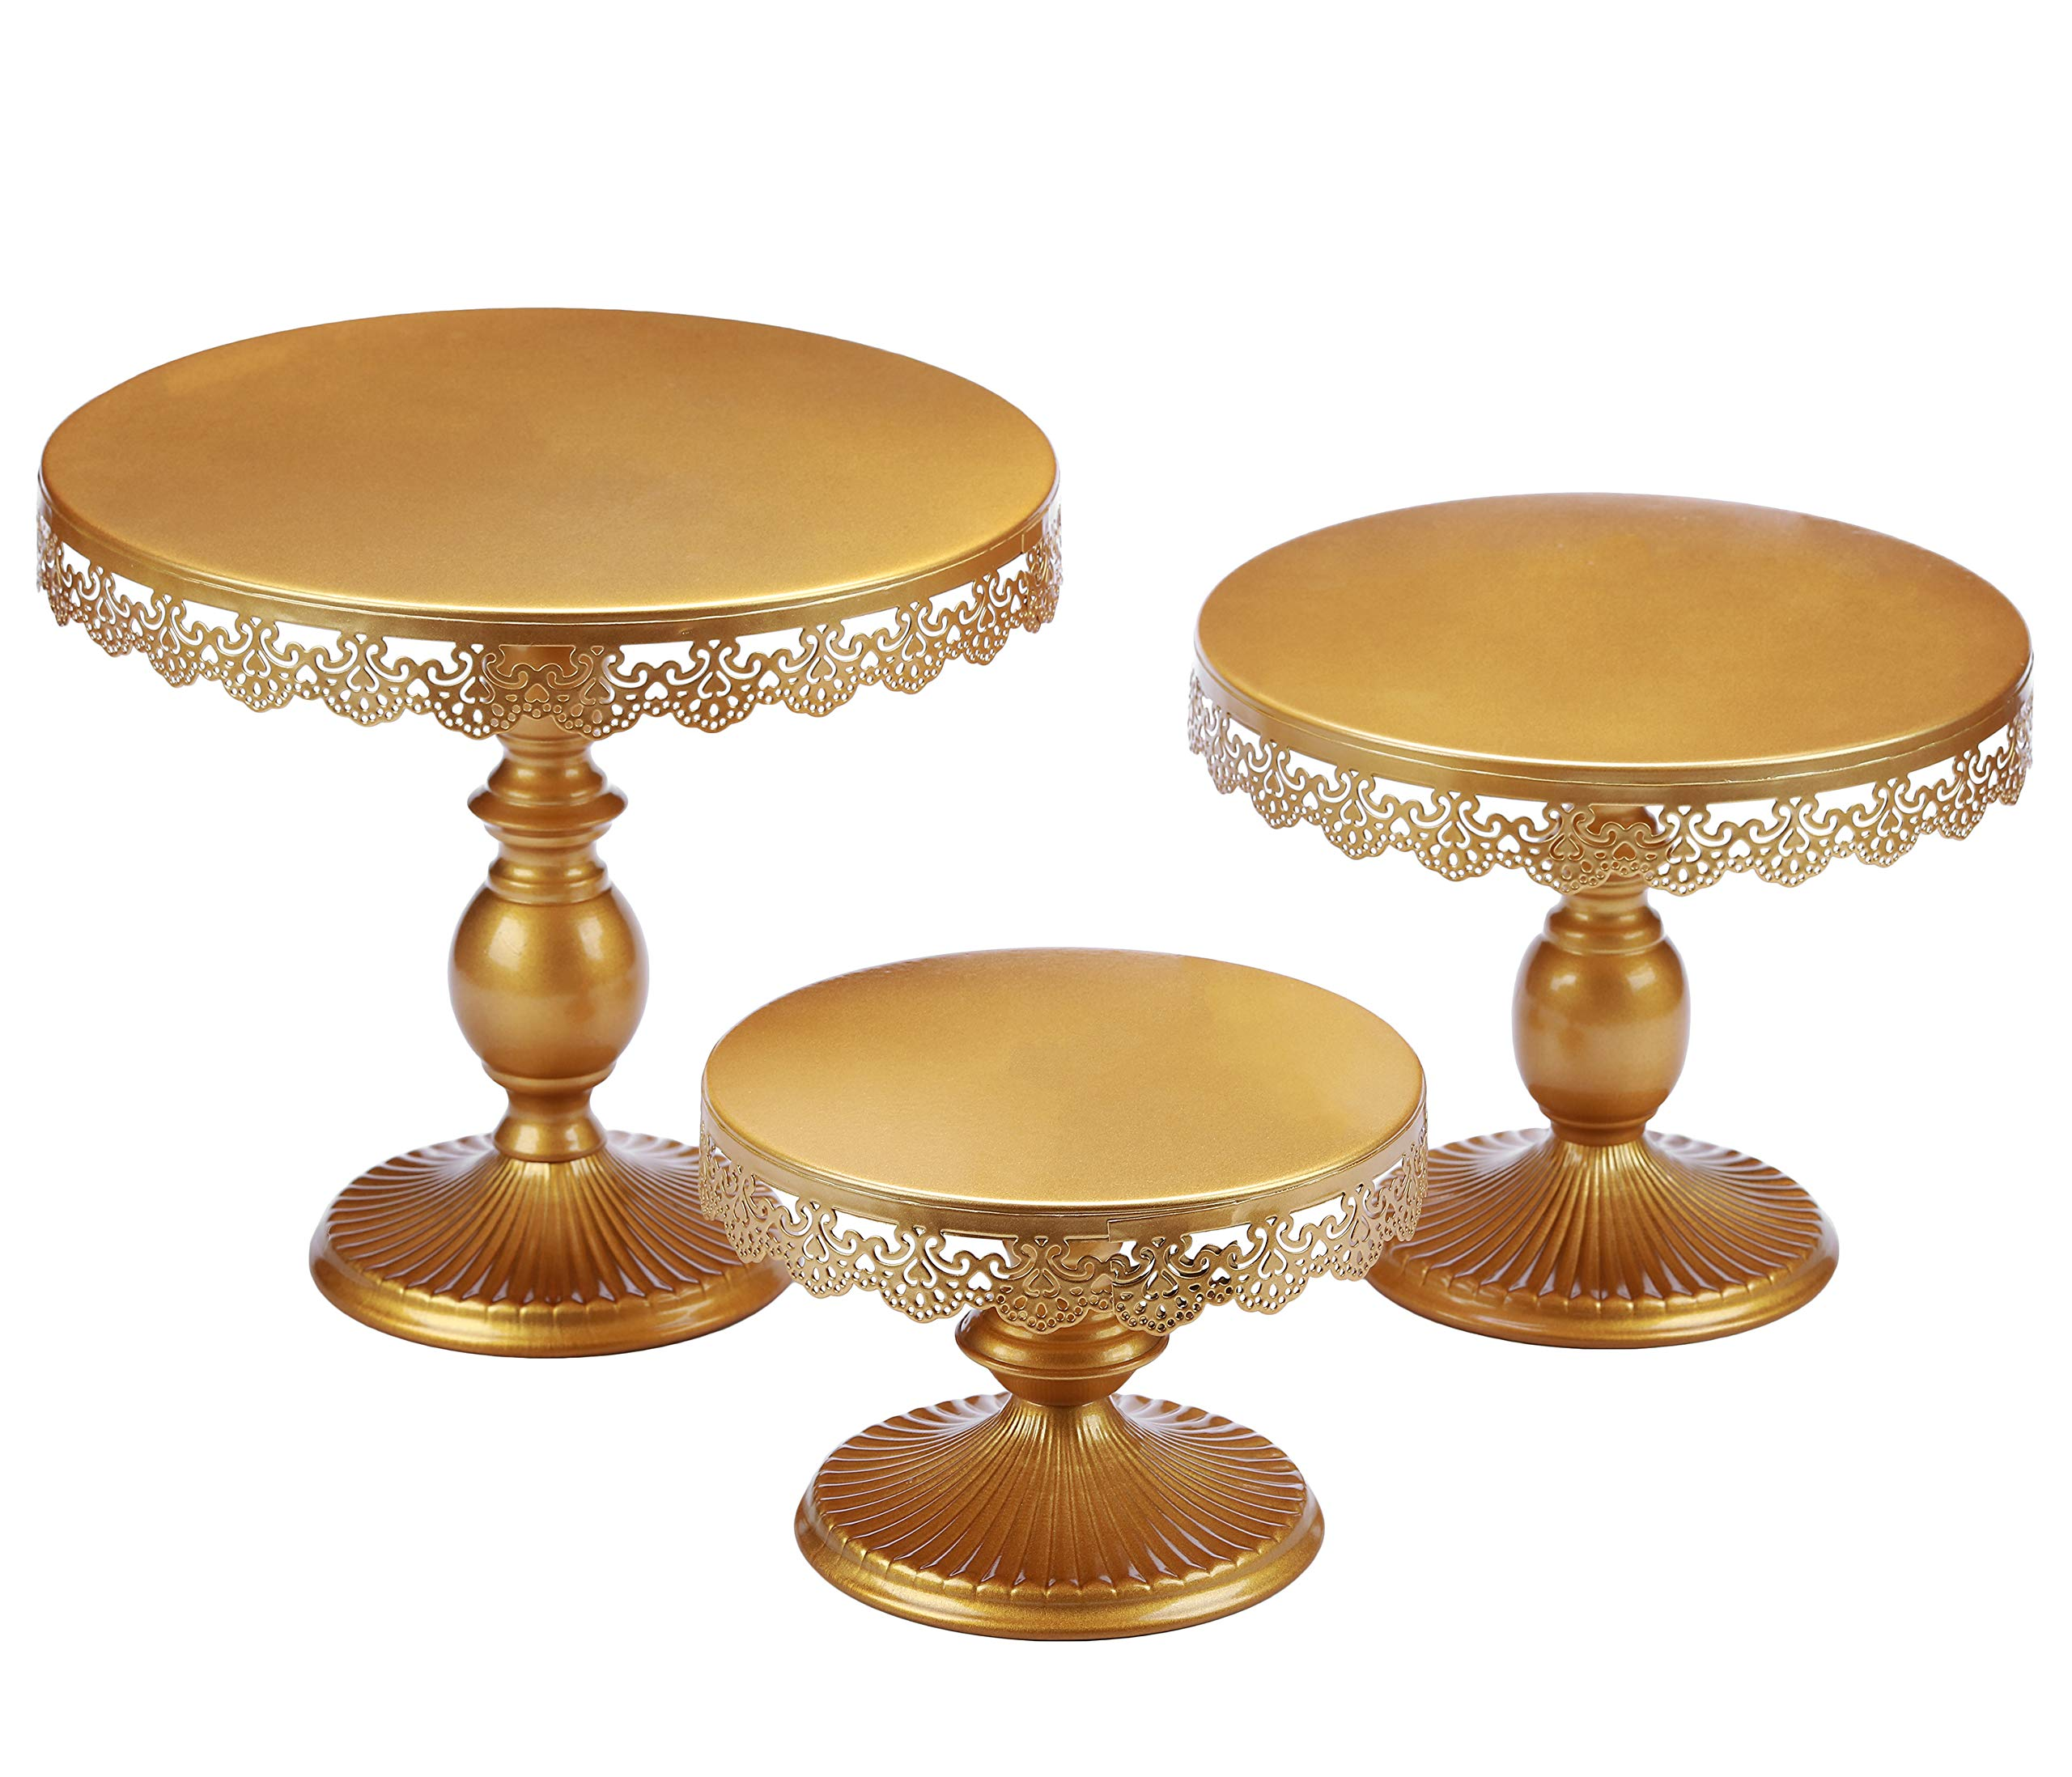 VILAVITA Set of 3 Cake Stands Round Cupcake Stands Metal Dessert Display Cake Stand, Gold